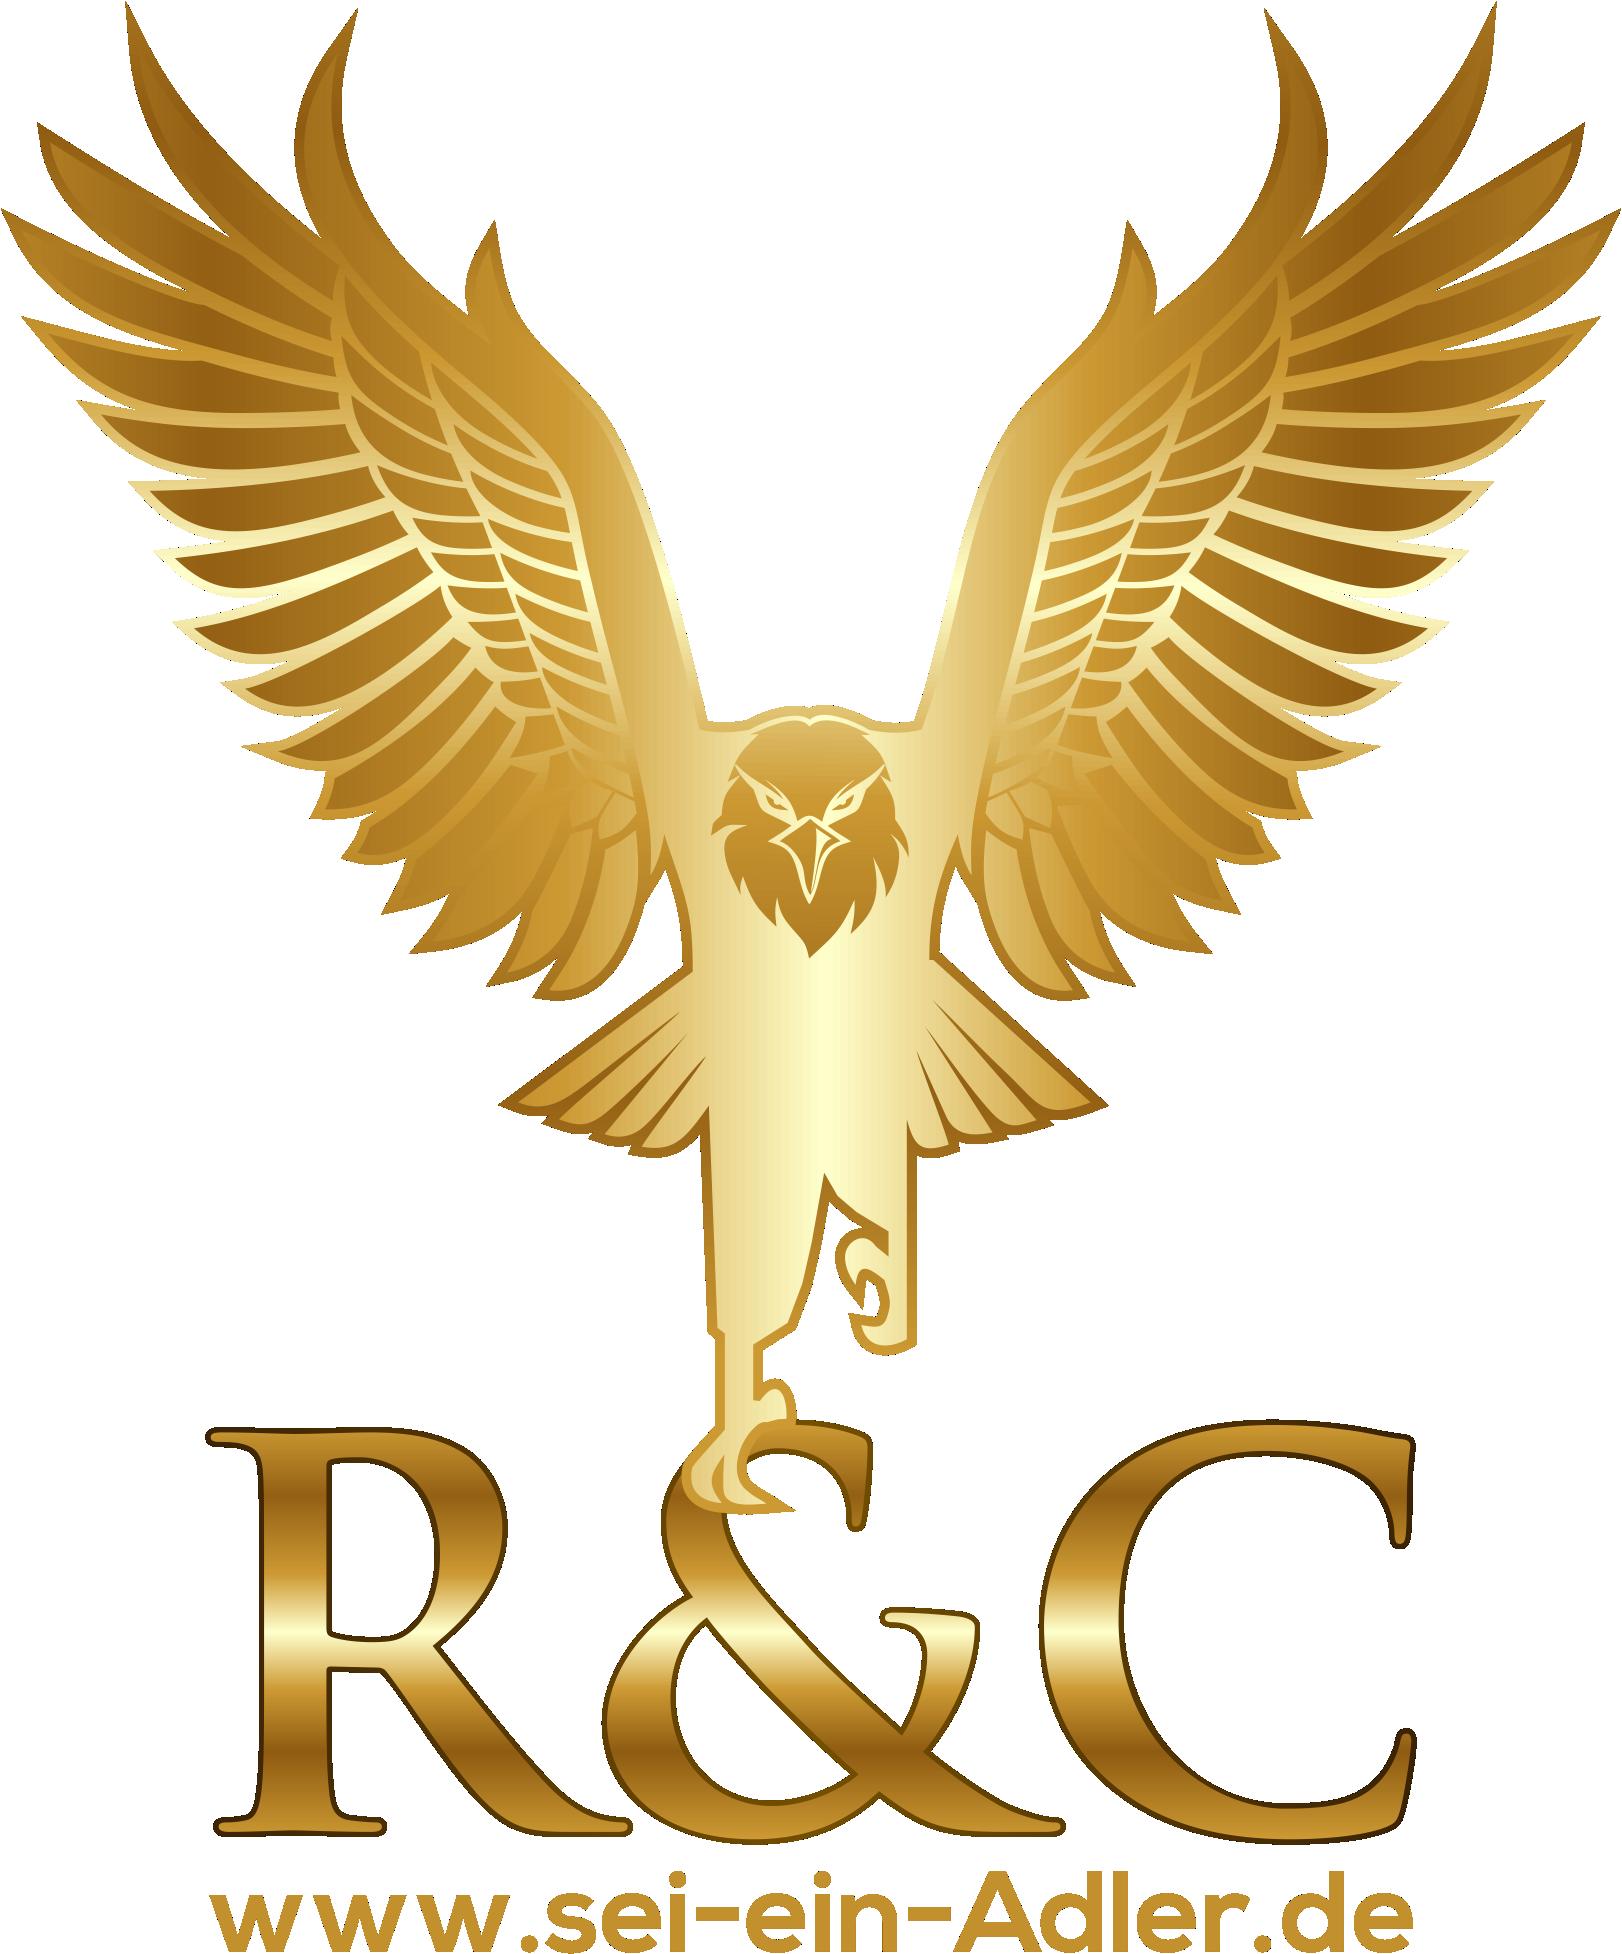 Anspruchsvolles Adler Logo